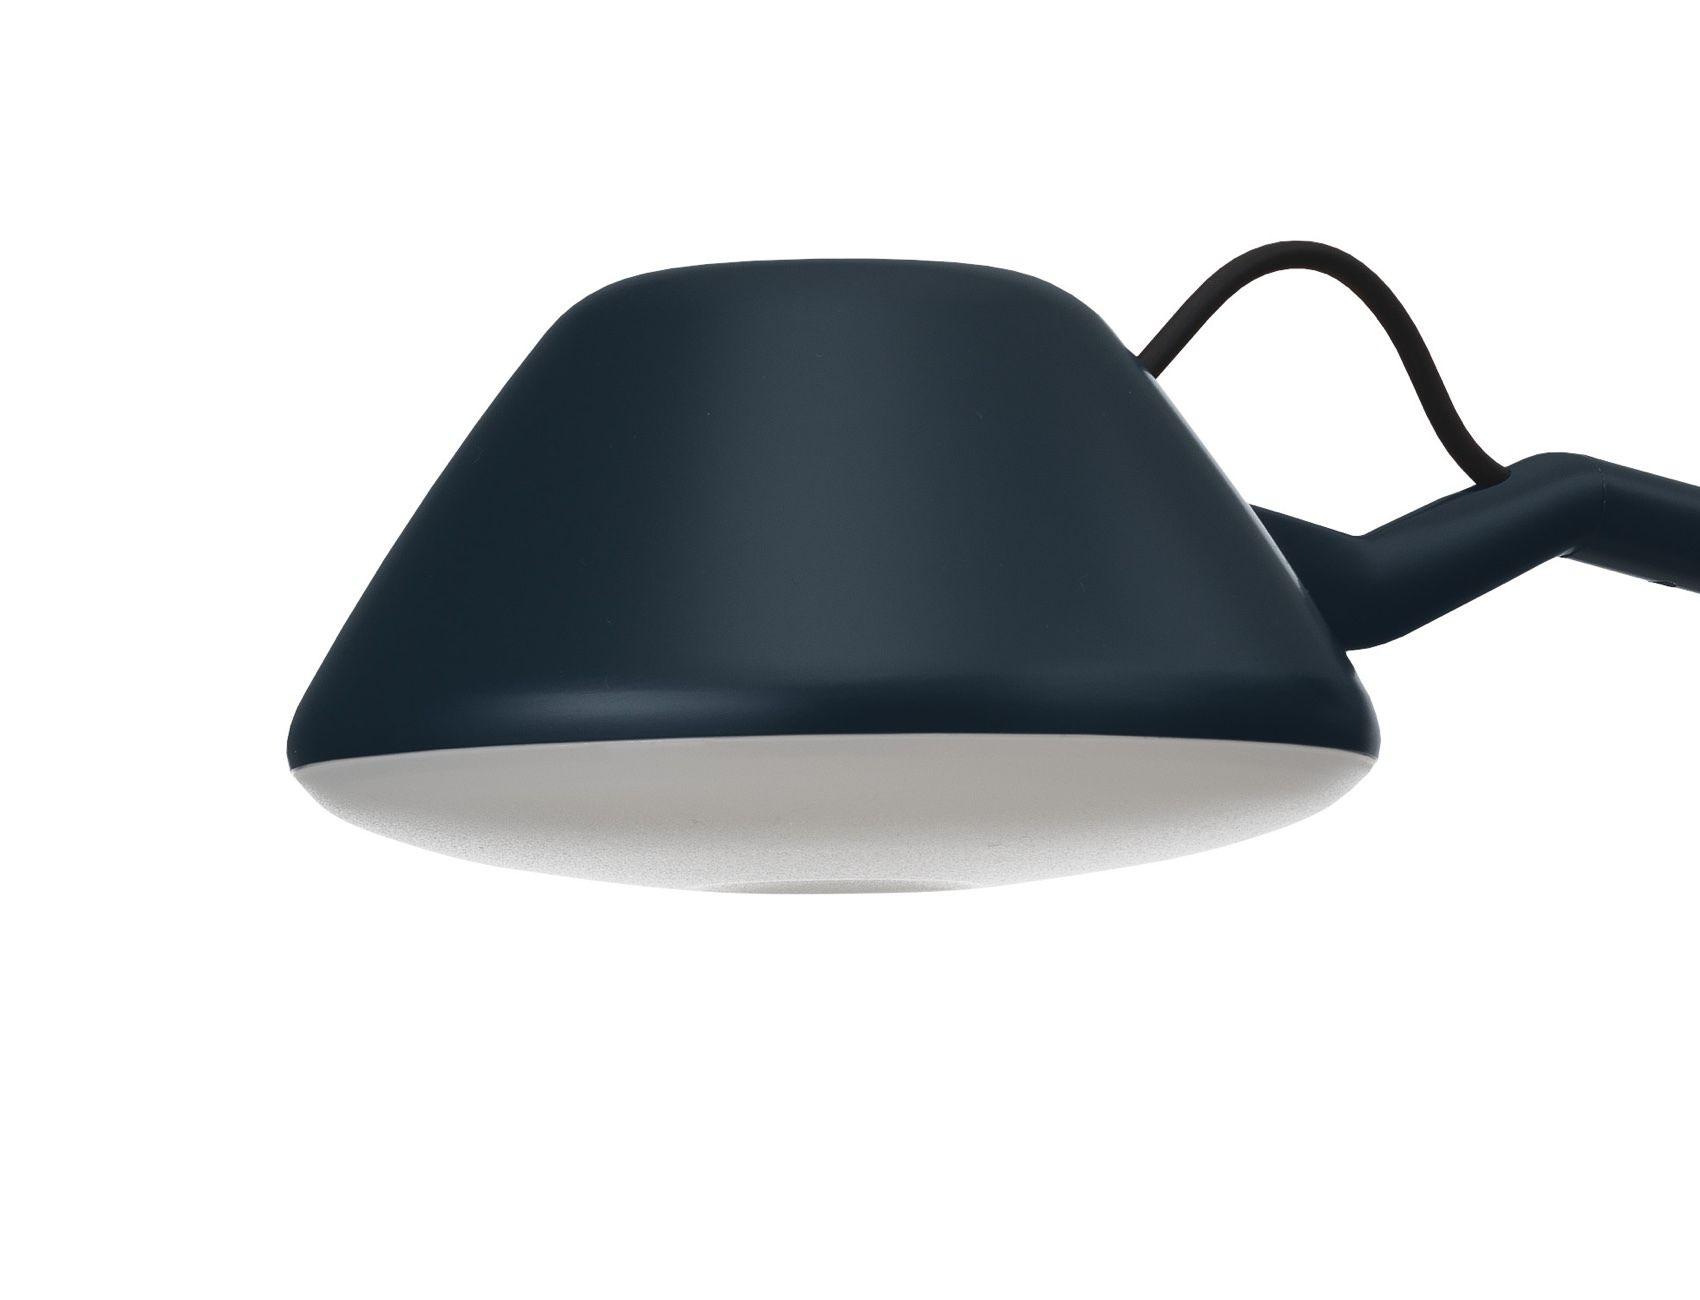 Lightyears AQ01 Table Light